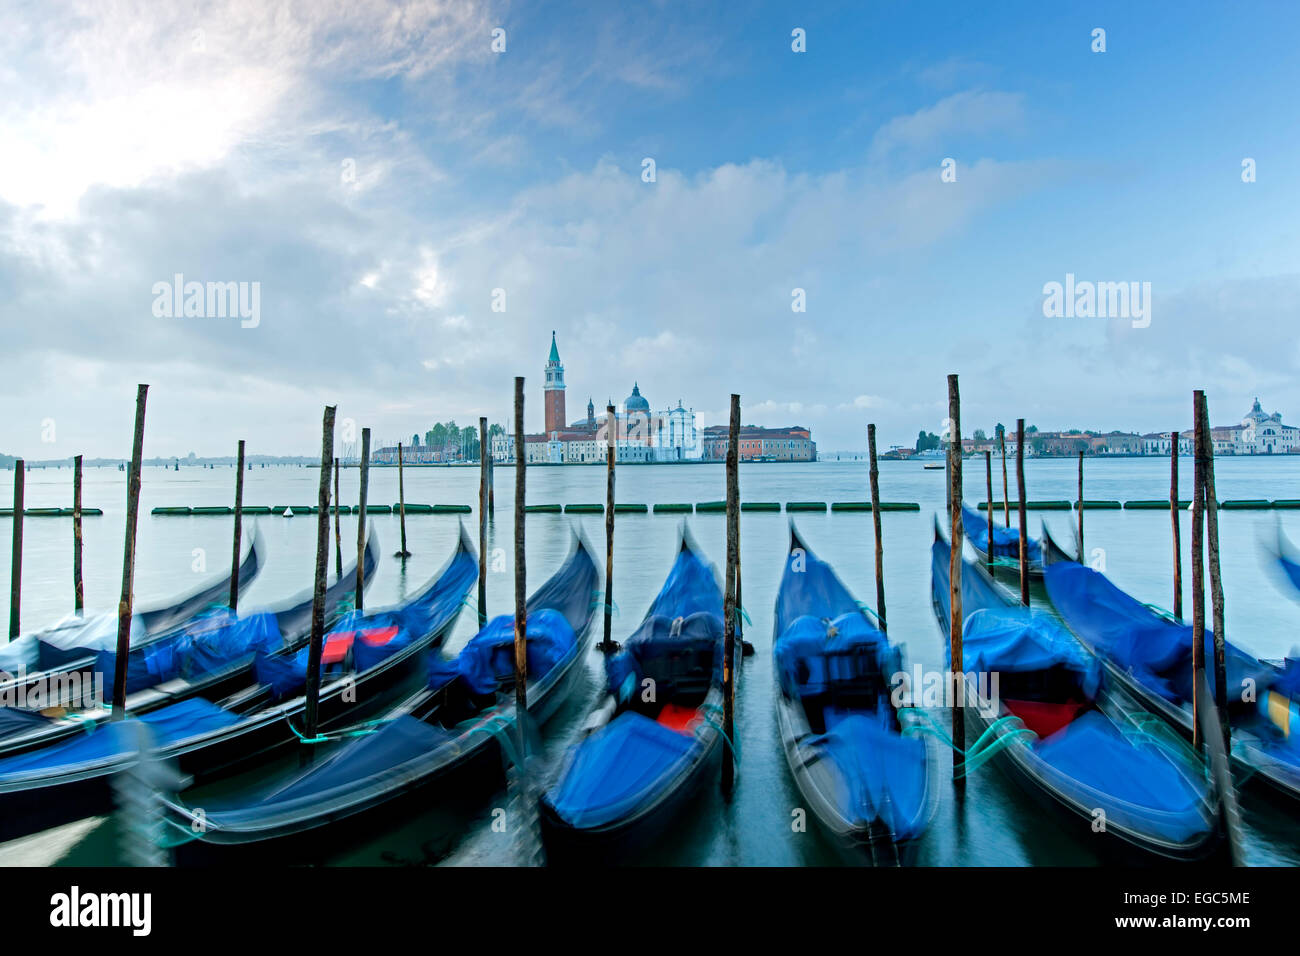 Les gondoles et San Giorgio Maggiore, à Venise, Italie Photo Stock